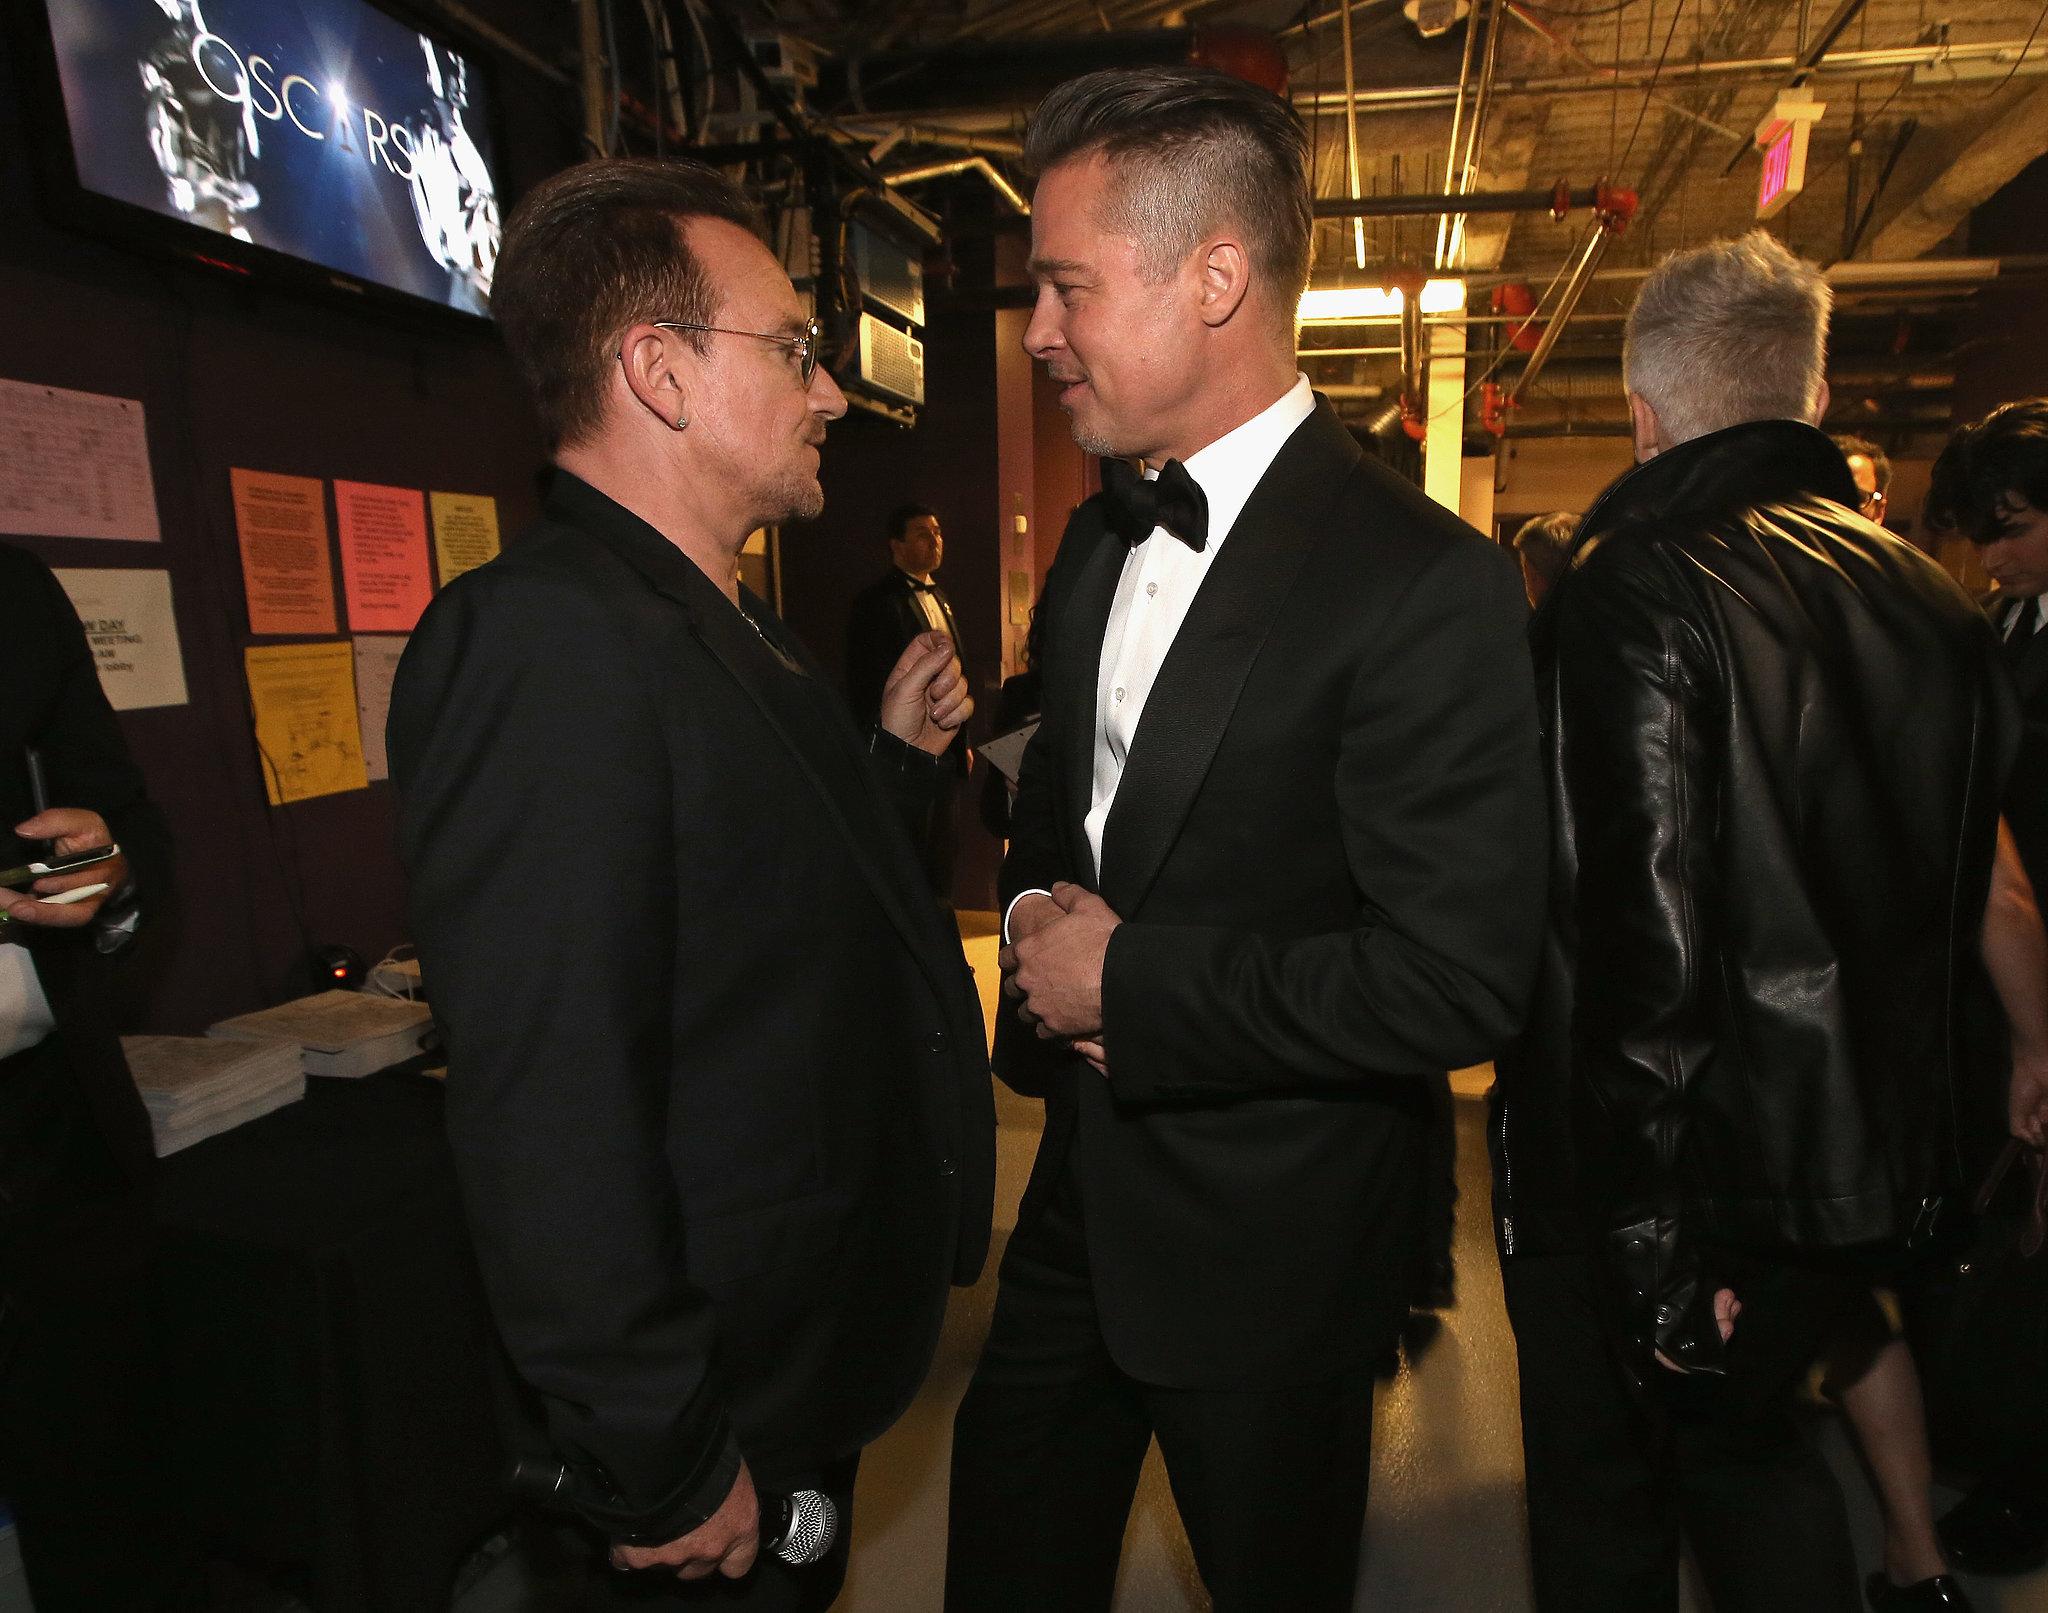 Brad Pitt and Bono talked backstage before U2 performed.